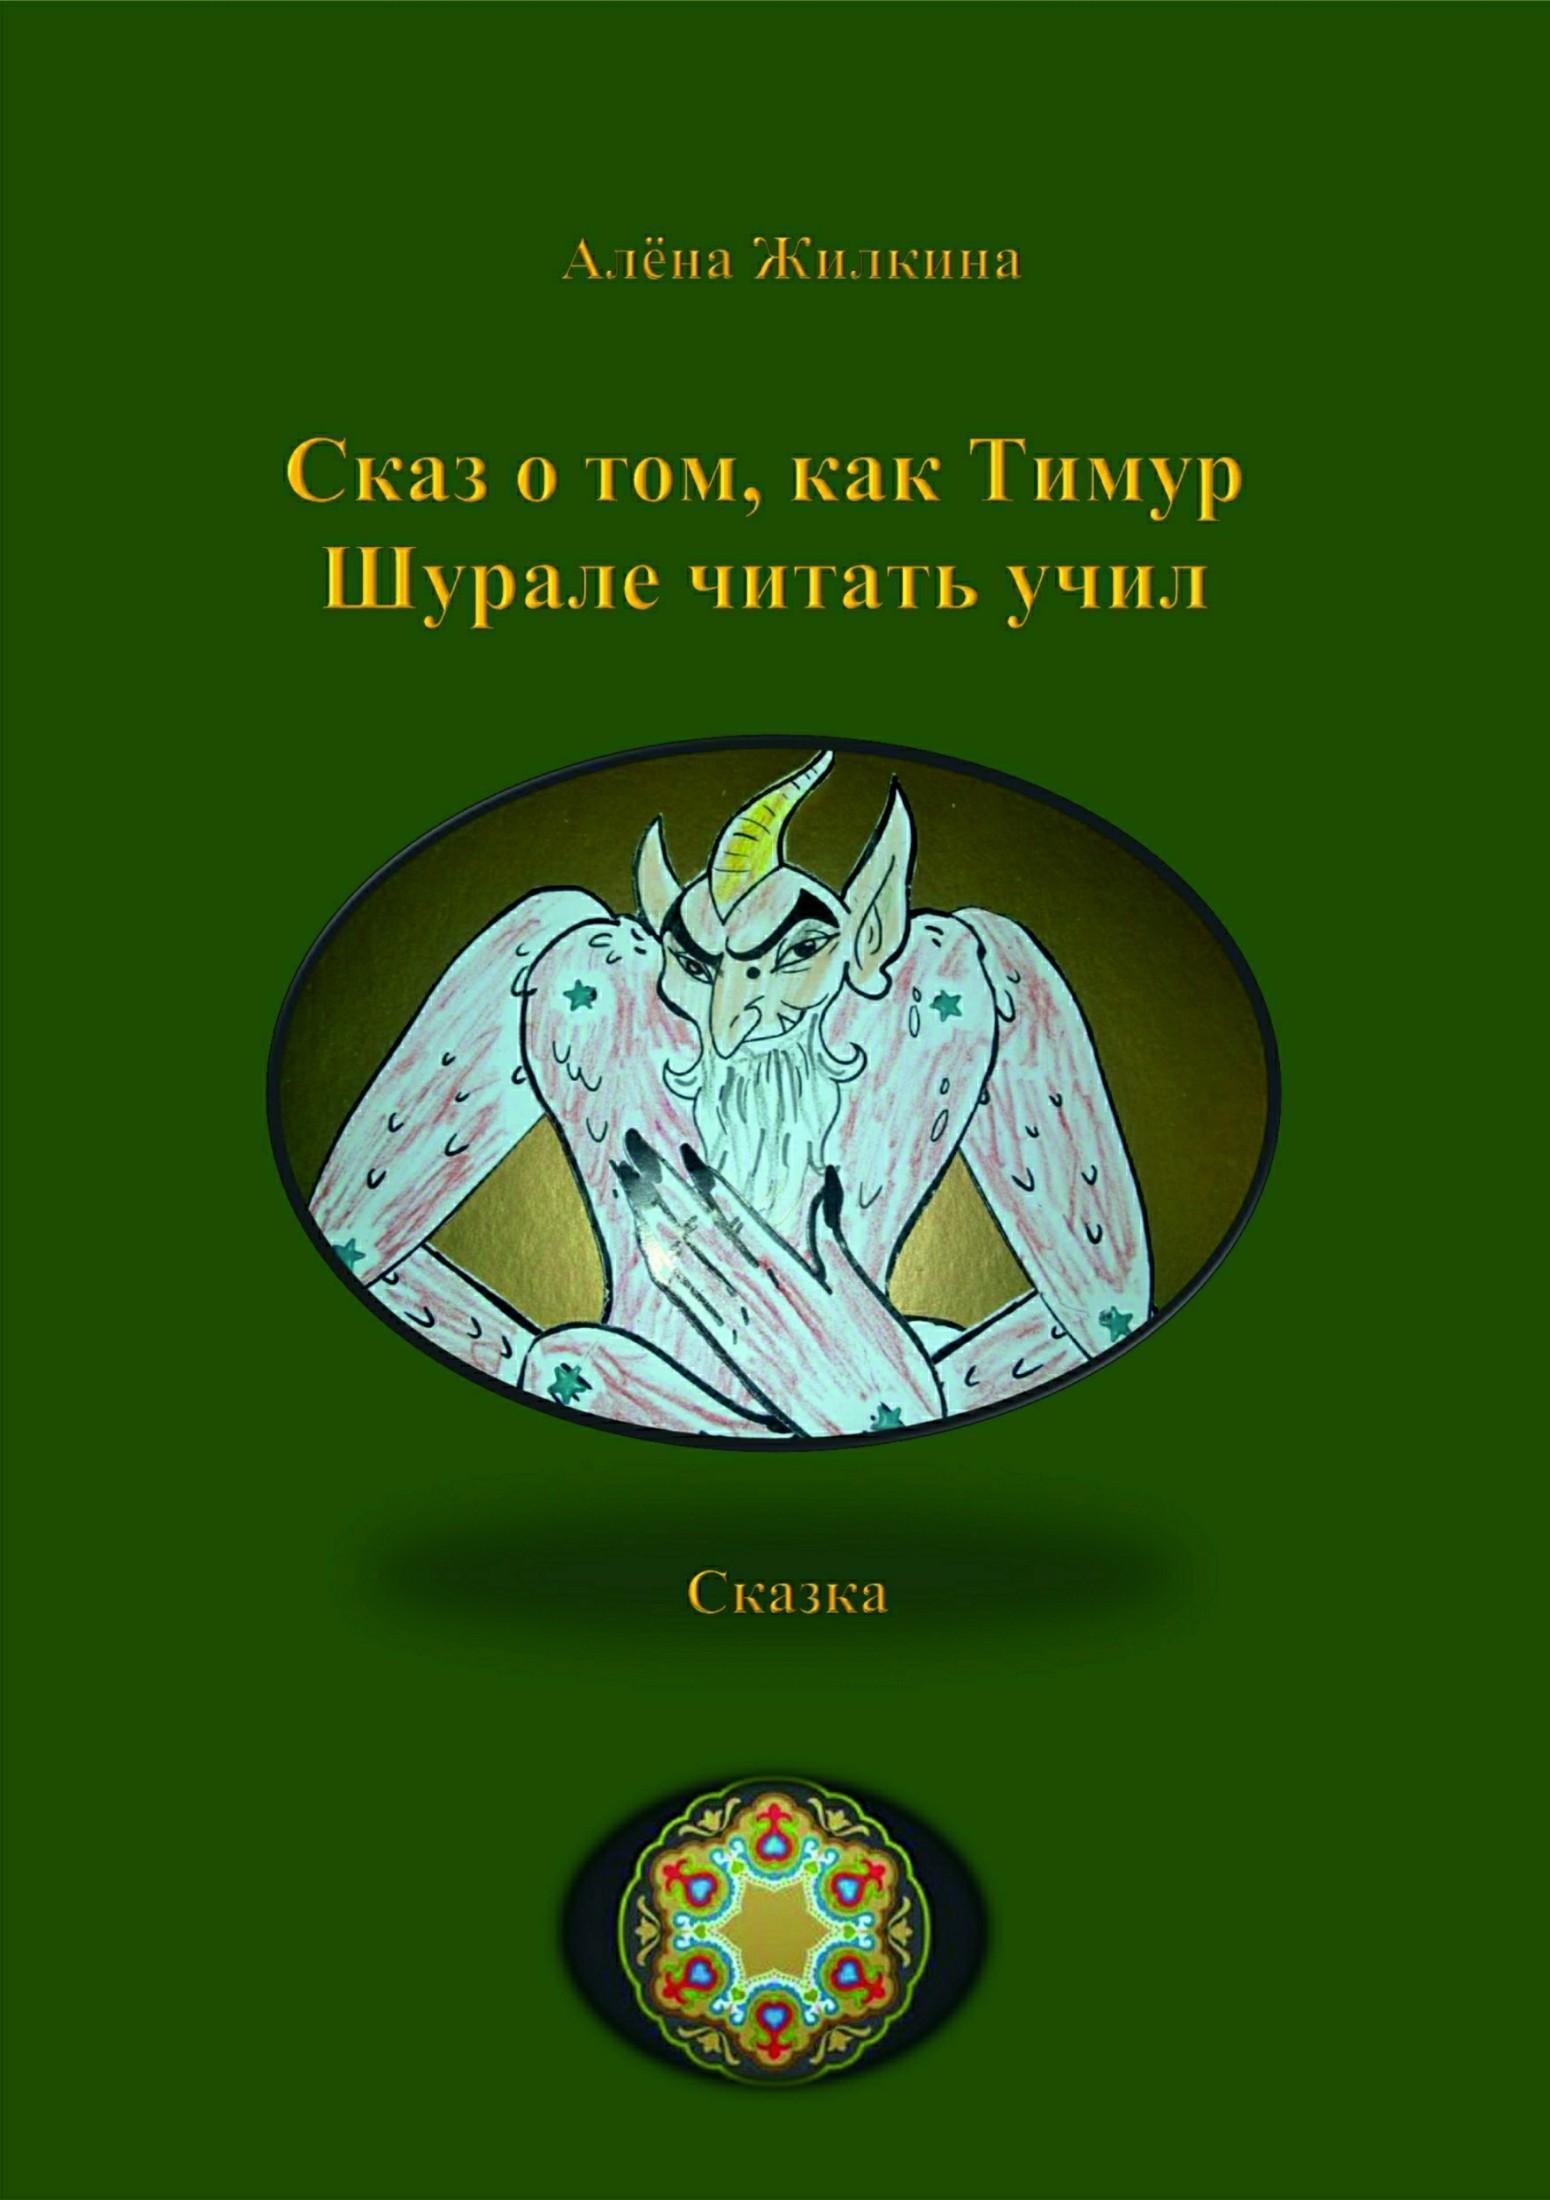 Алёна Жилкина - Сказ о том, как Тимур Шурале читать учил